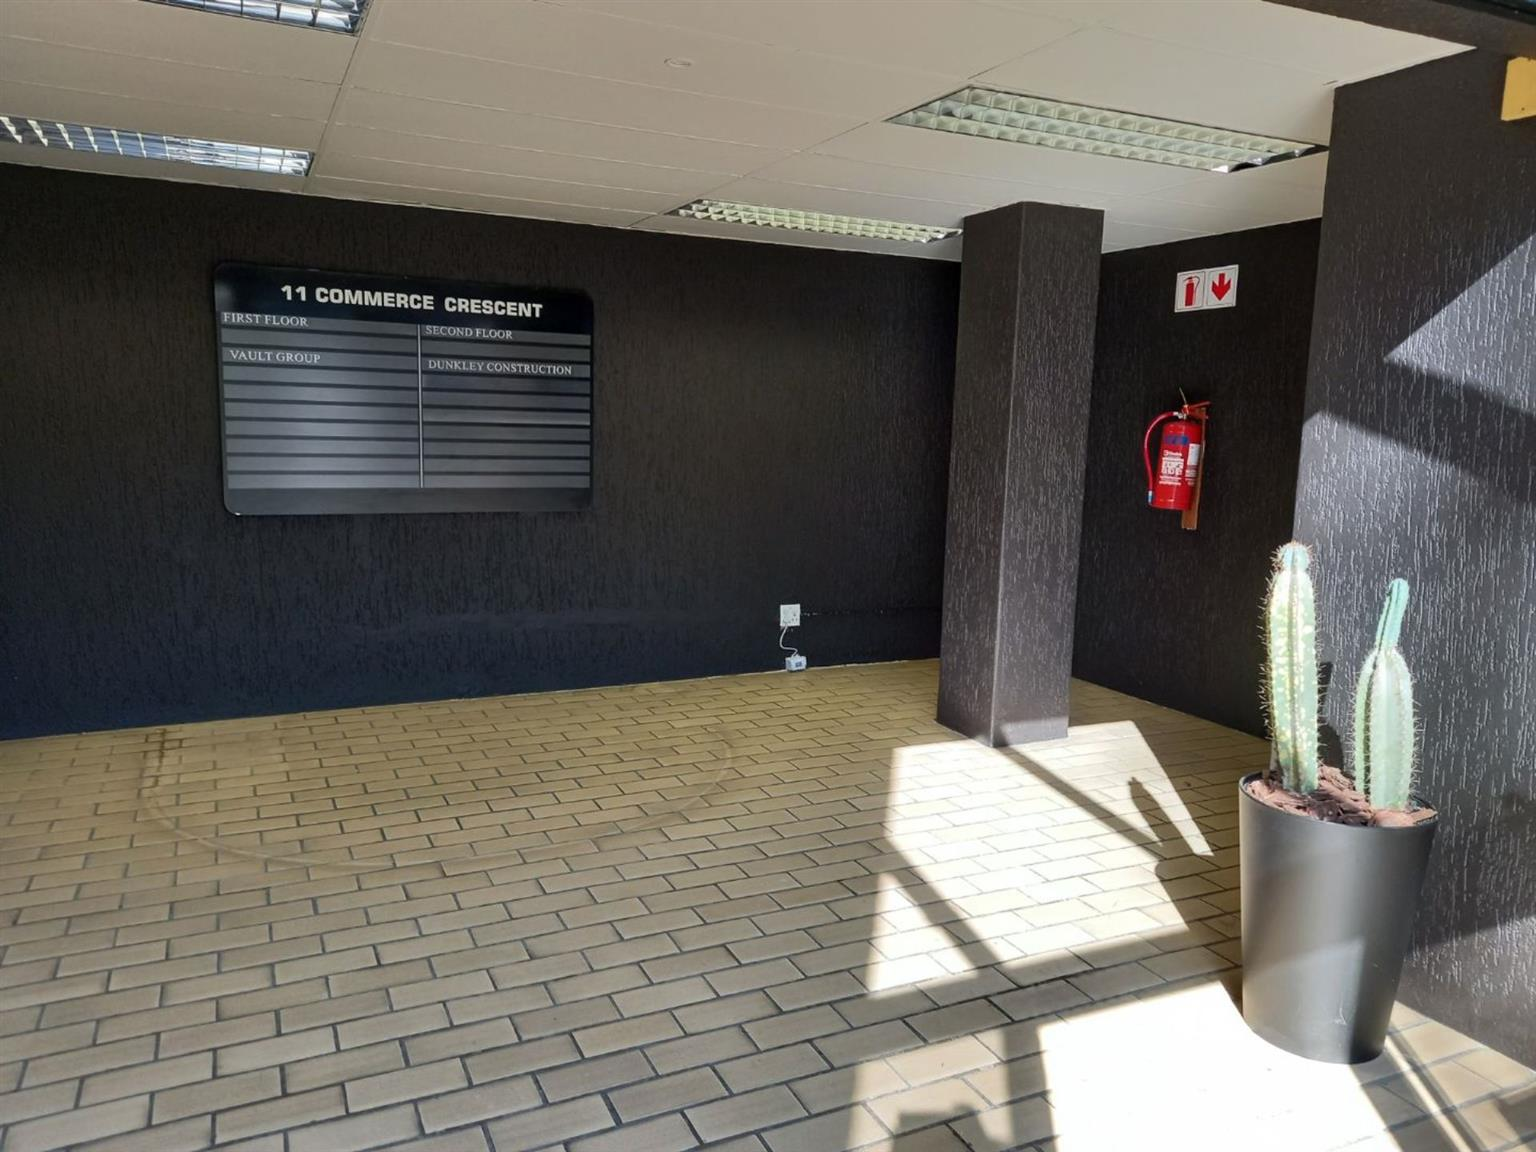 Office Rental Monthly in KRAMERVILLE